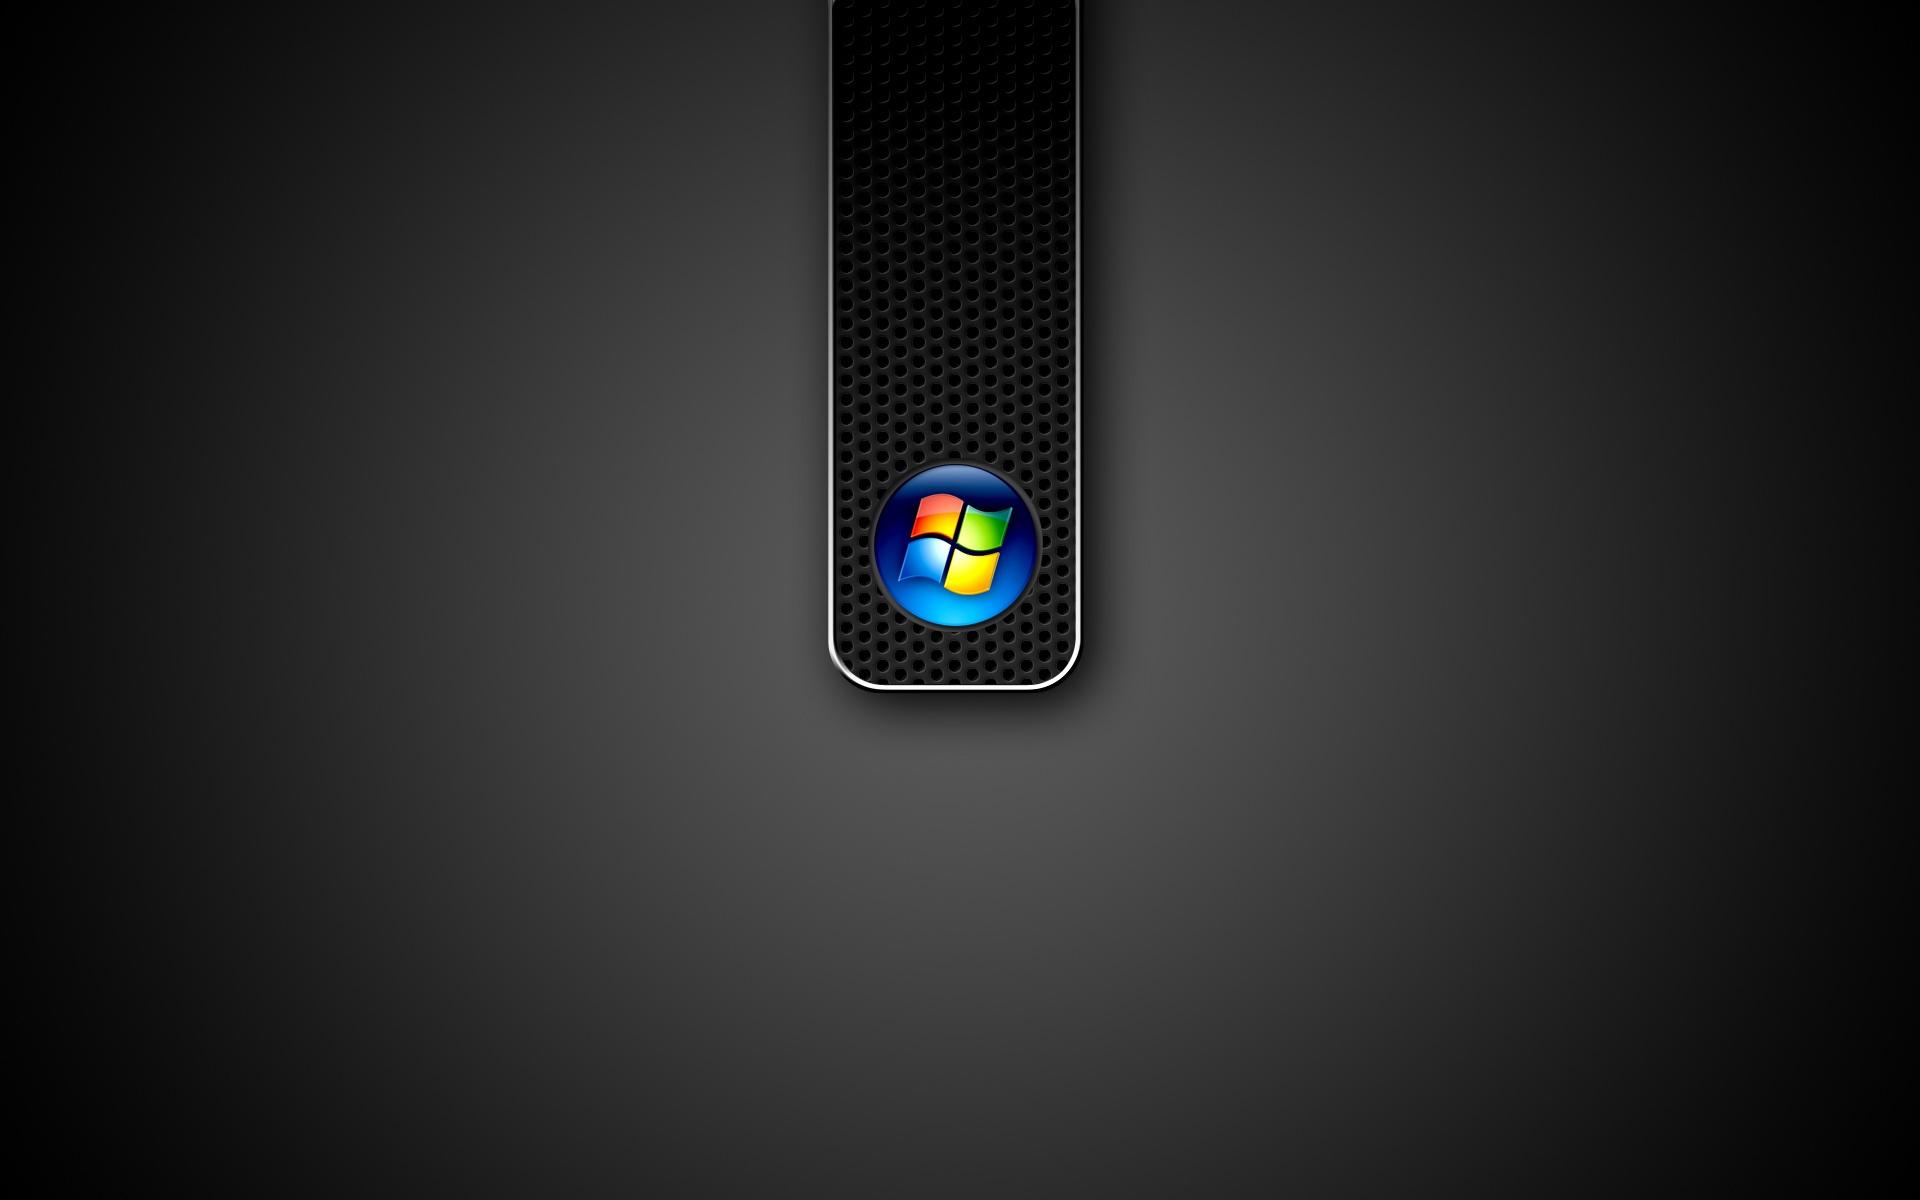 Windows logo 1920x1200